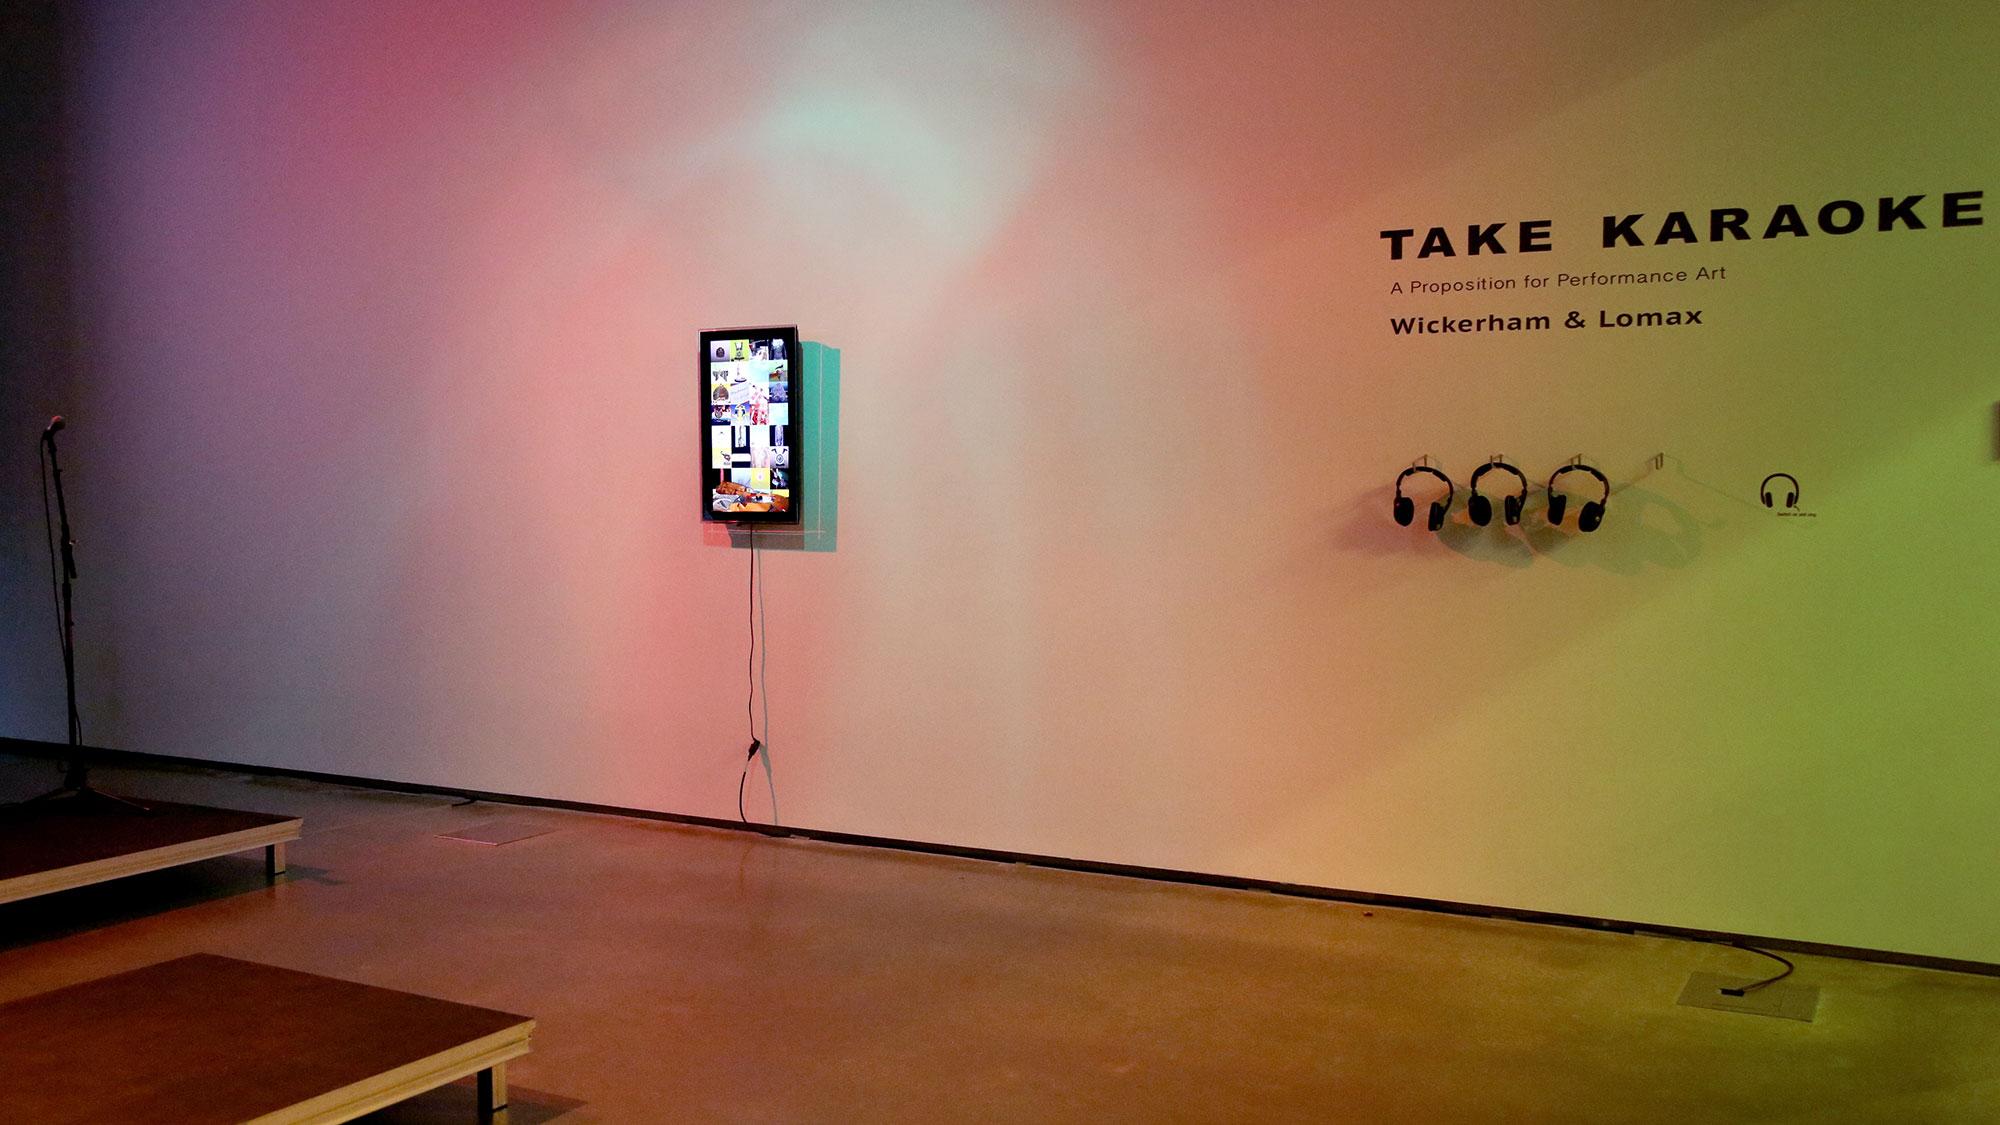 Take Karaoke: A Proposition for Performance Art